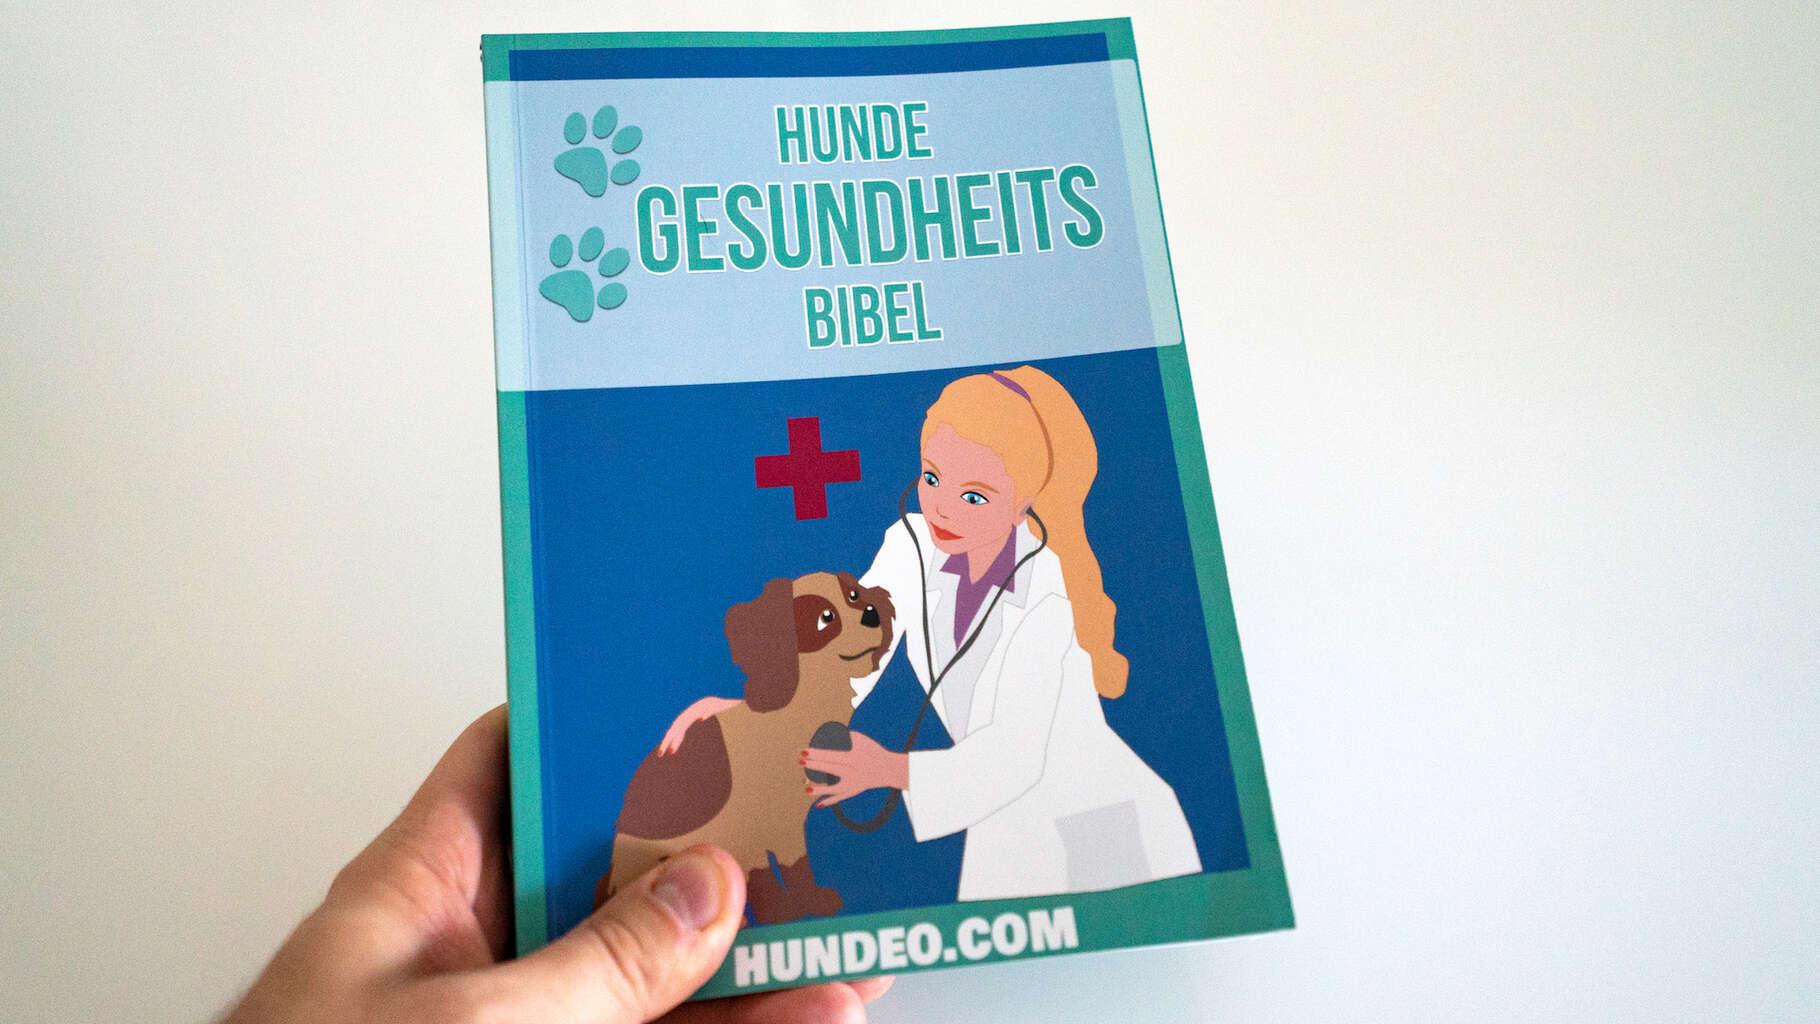 hunde gesundheits bibel 2